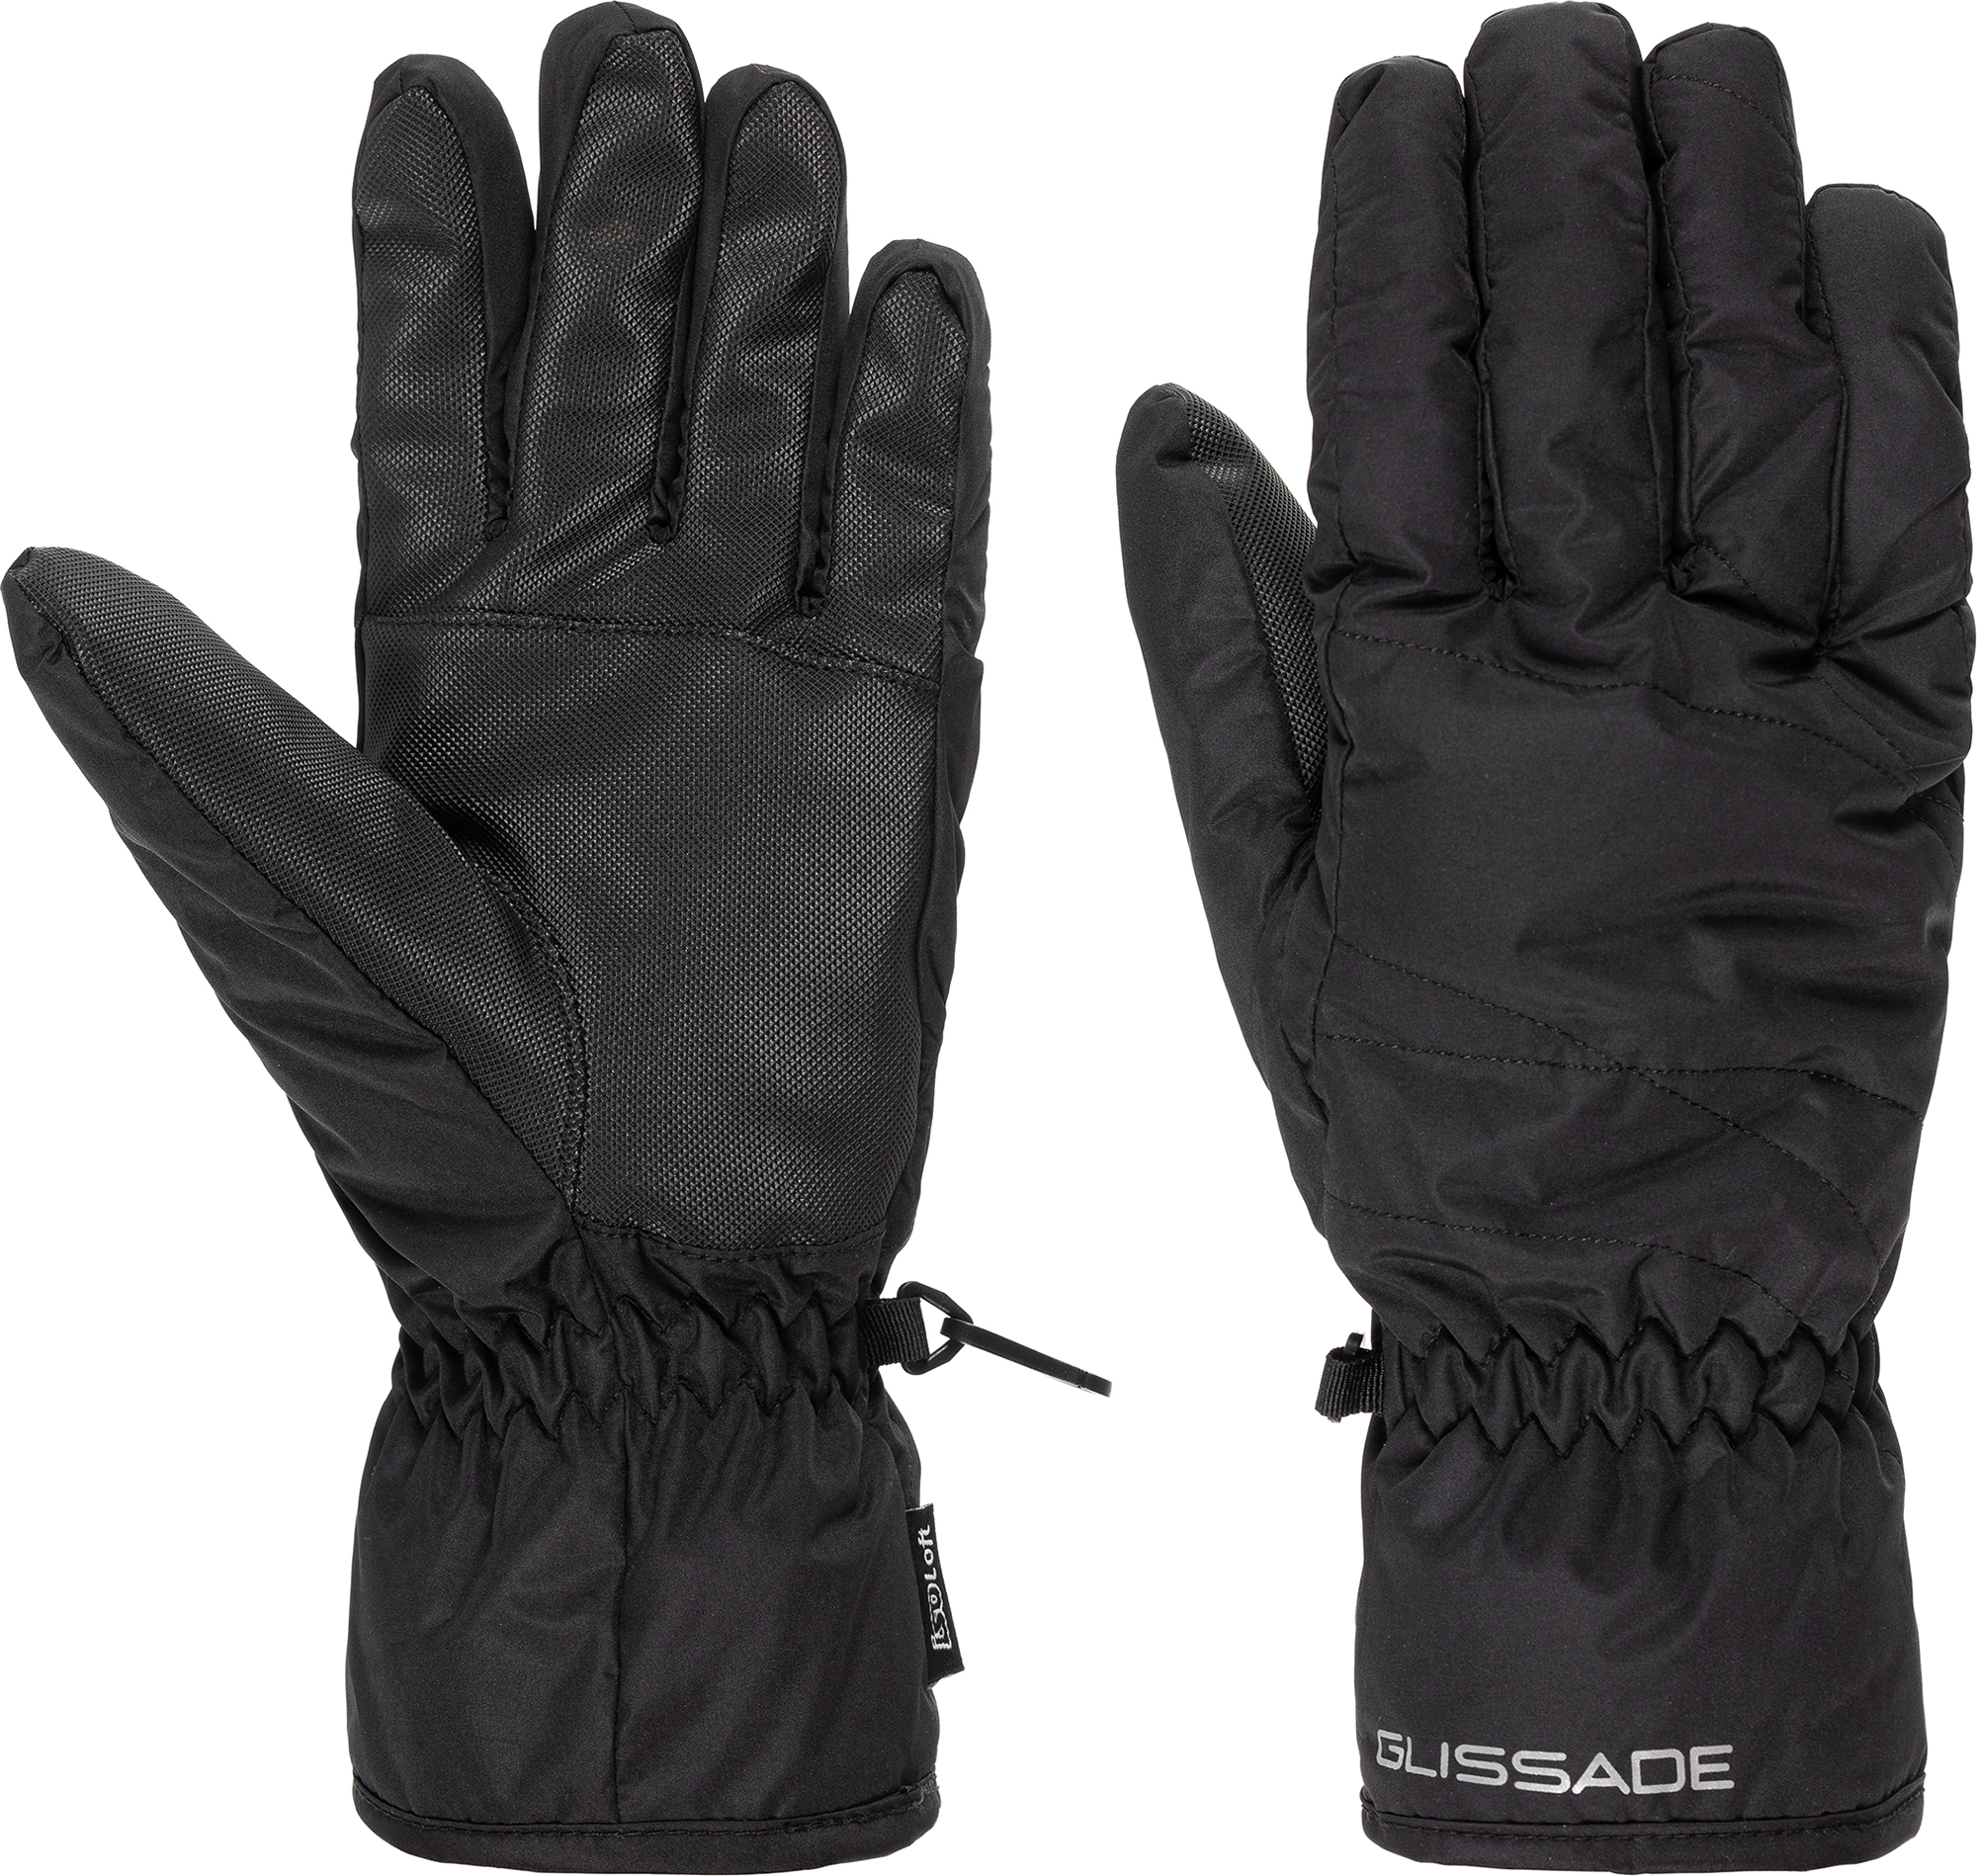 Фото - Glissade Перчатки женские Glissade, размер 7 перчатки женские fabretti цвет черный зеленый 12 66 1 15 black green размер 7 5